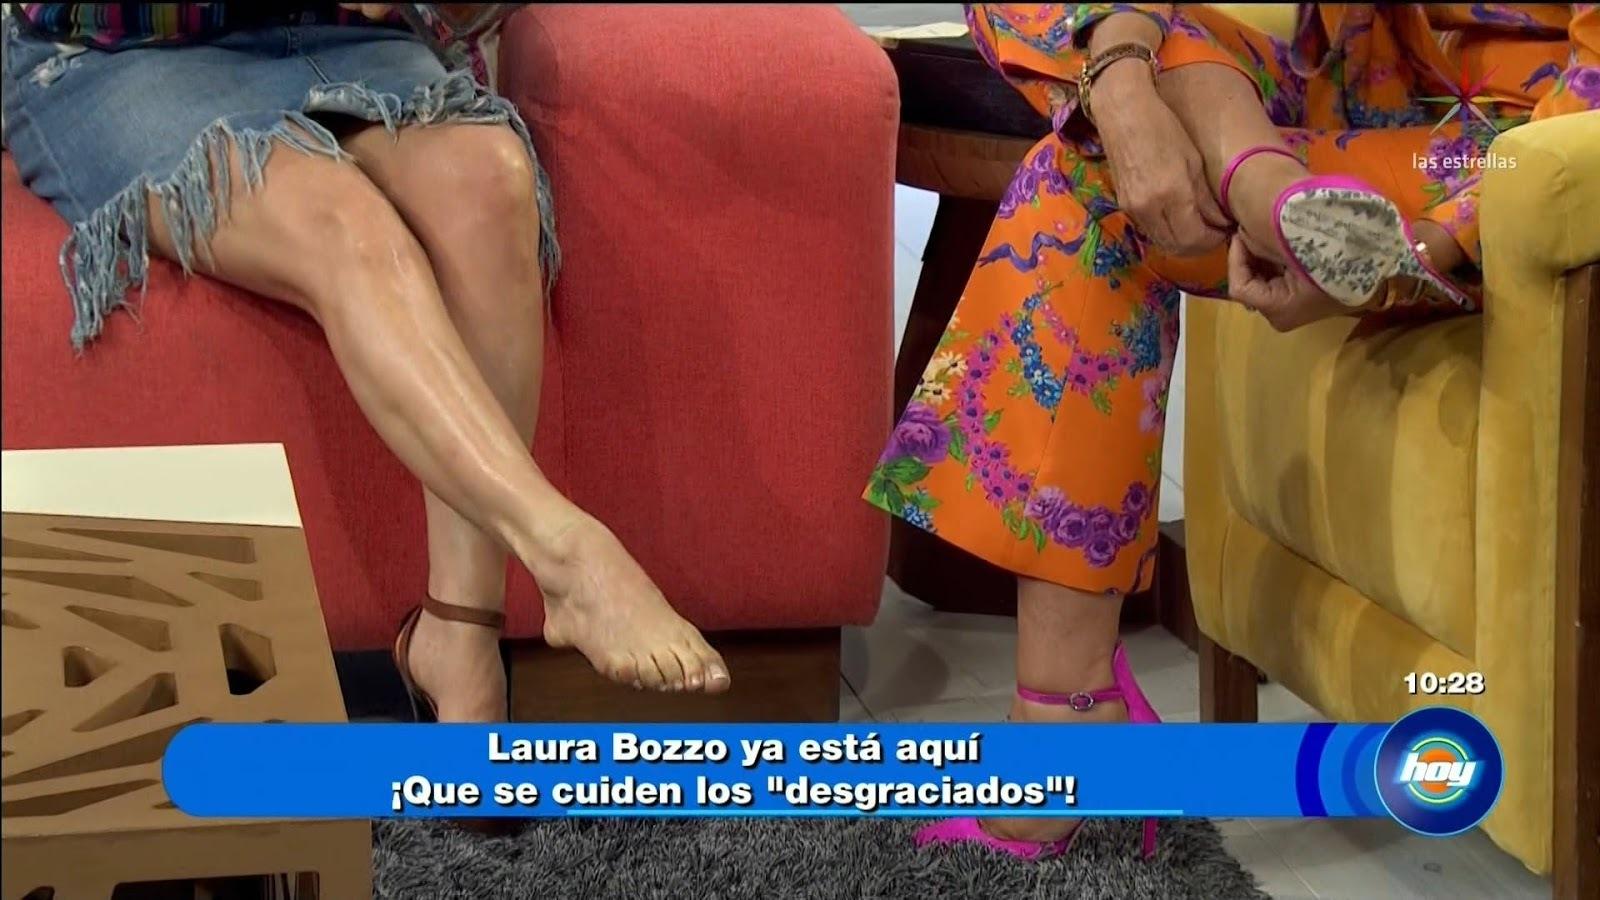 Actrices Porno Feet Top andrea legarreta's feet << wikifeet